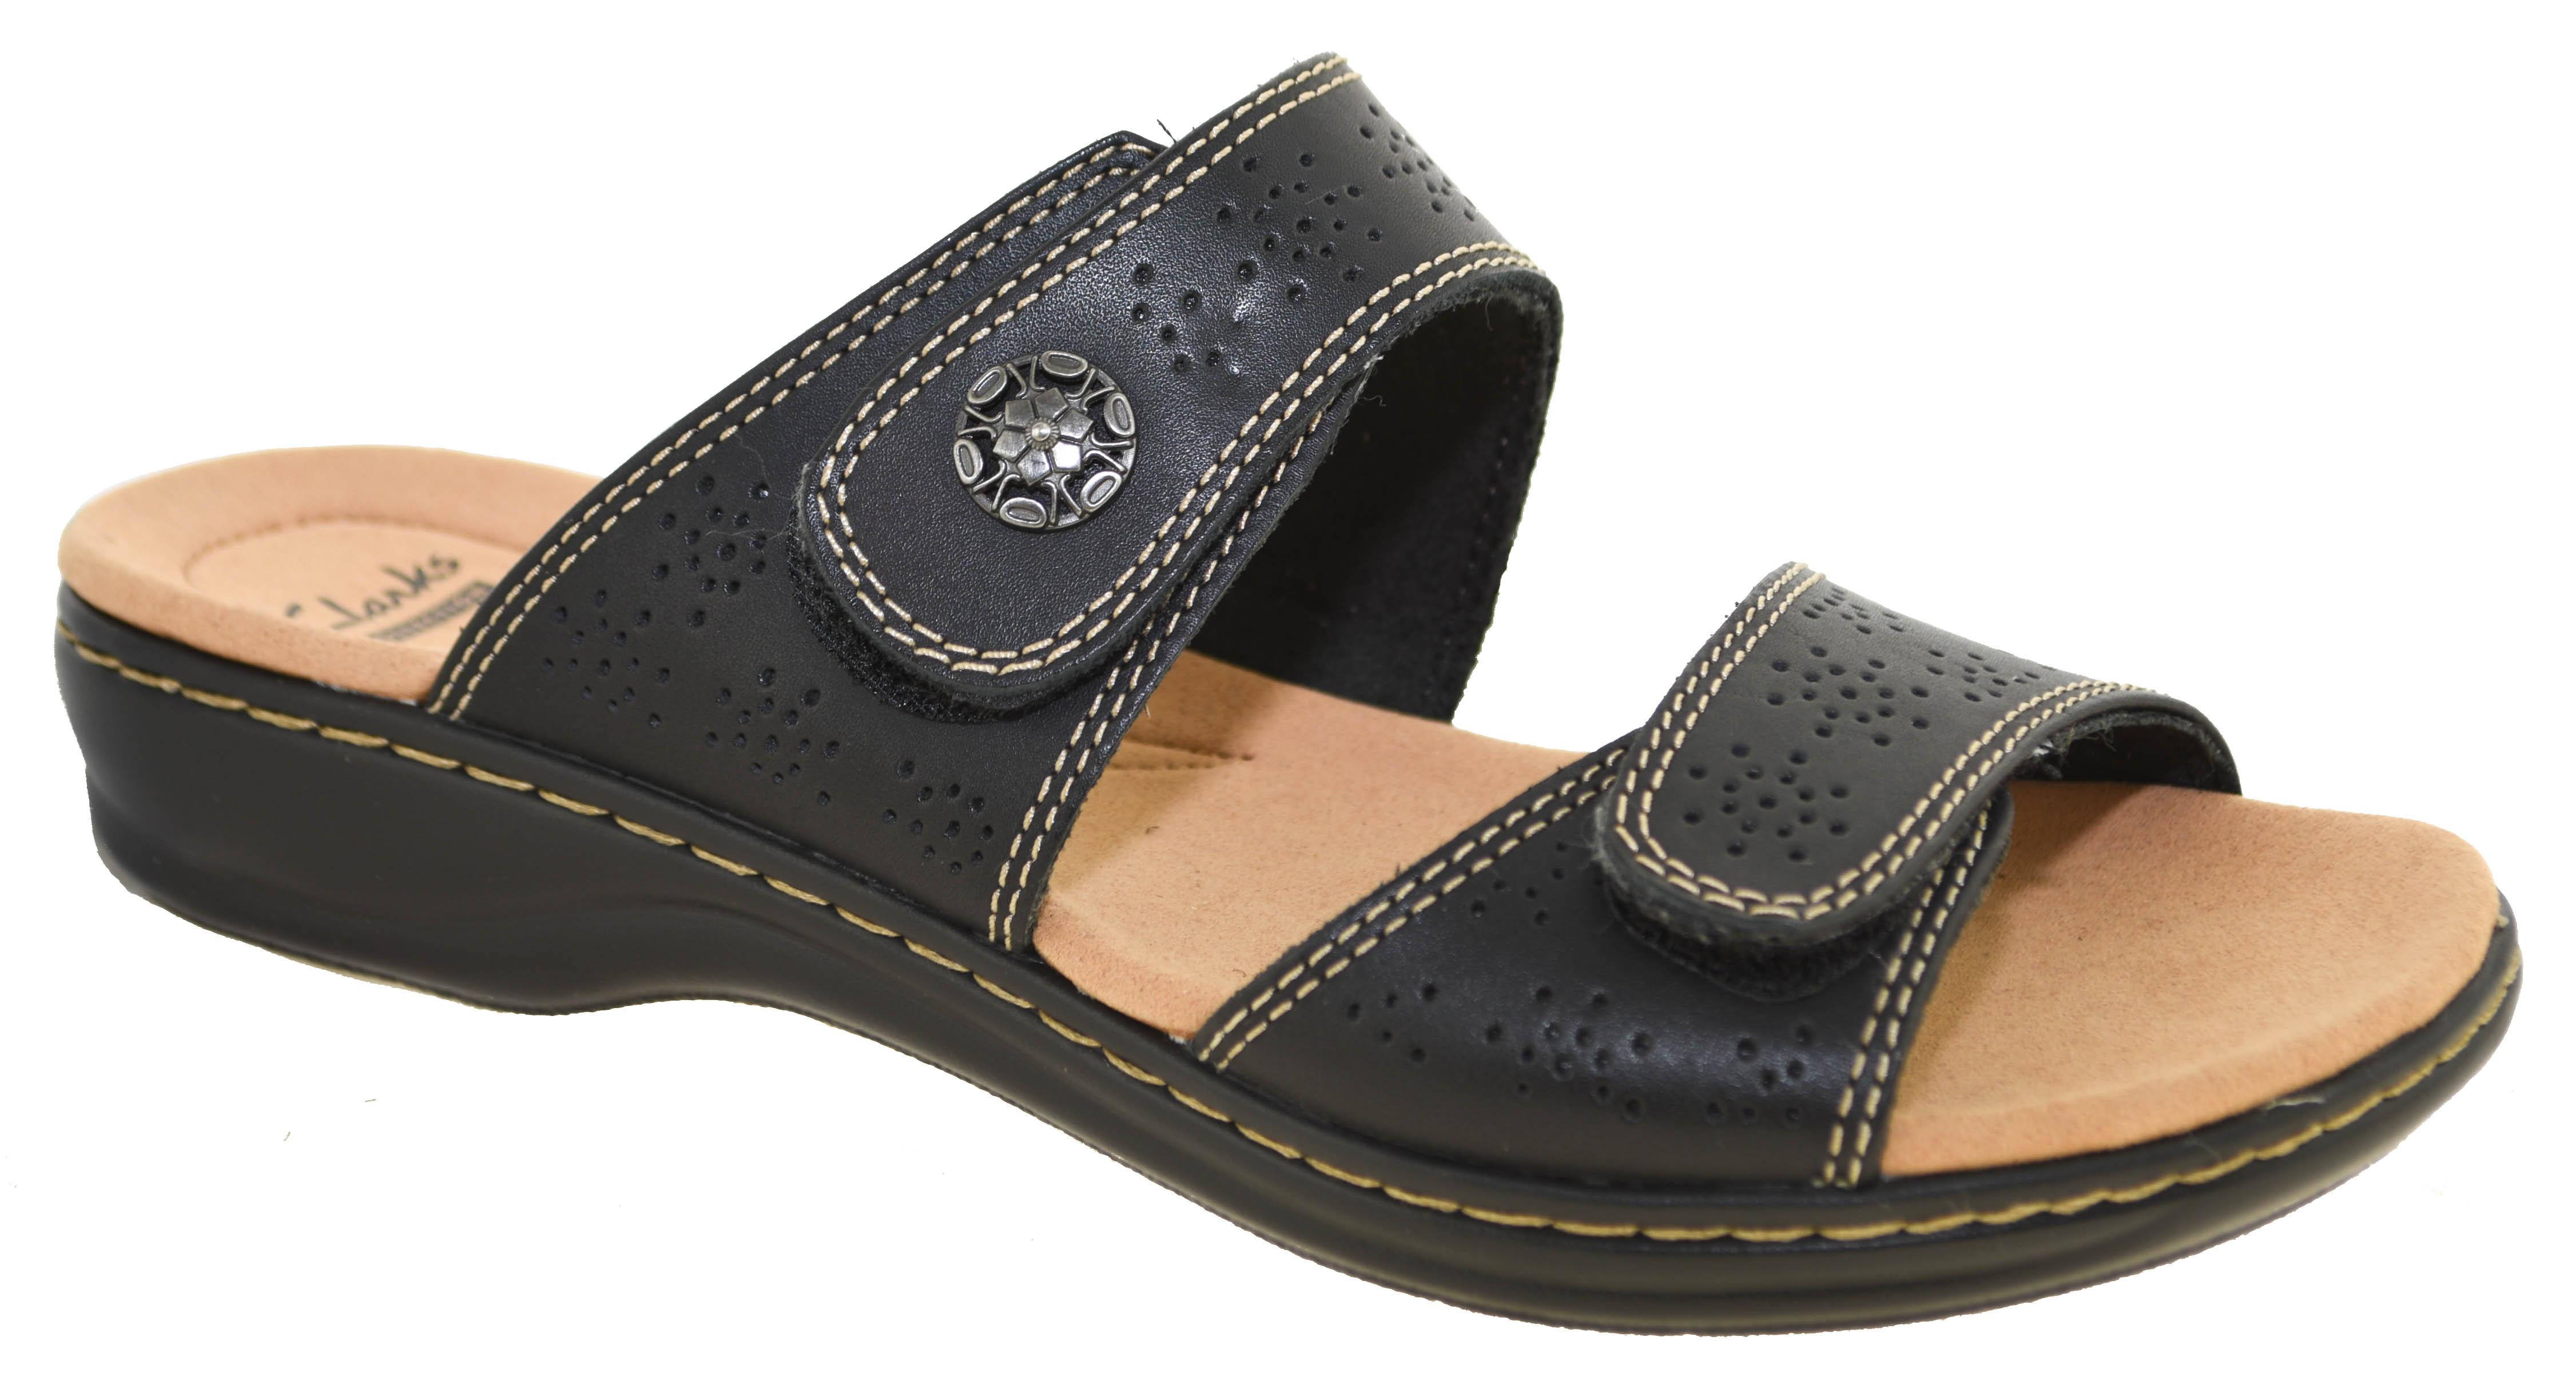 Clarks Damens's Leisa Lacole Slide Sandales schwarz Style 24793 24793 24793     7cb757